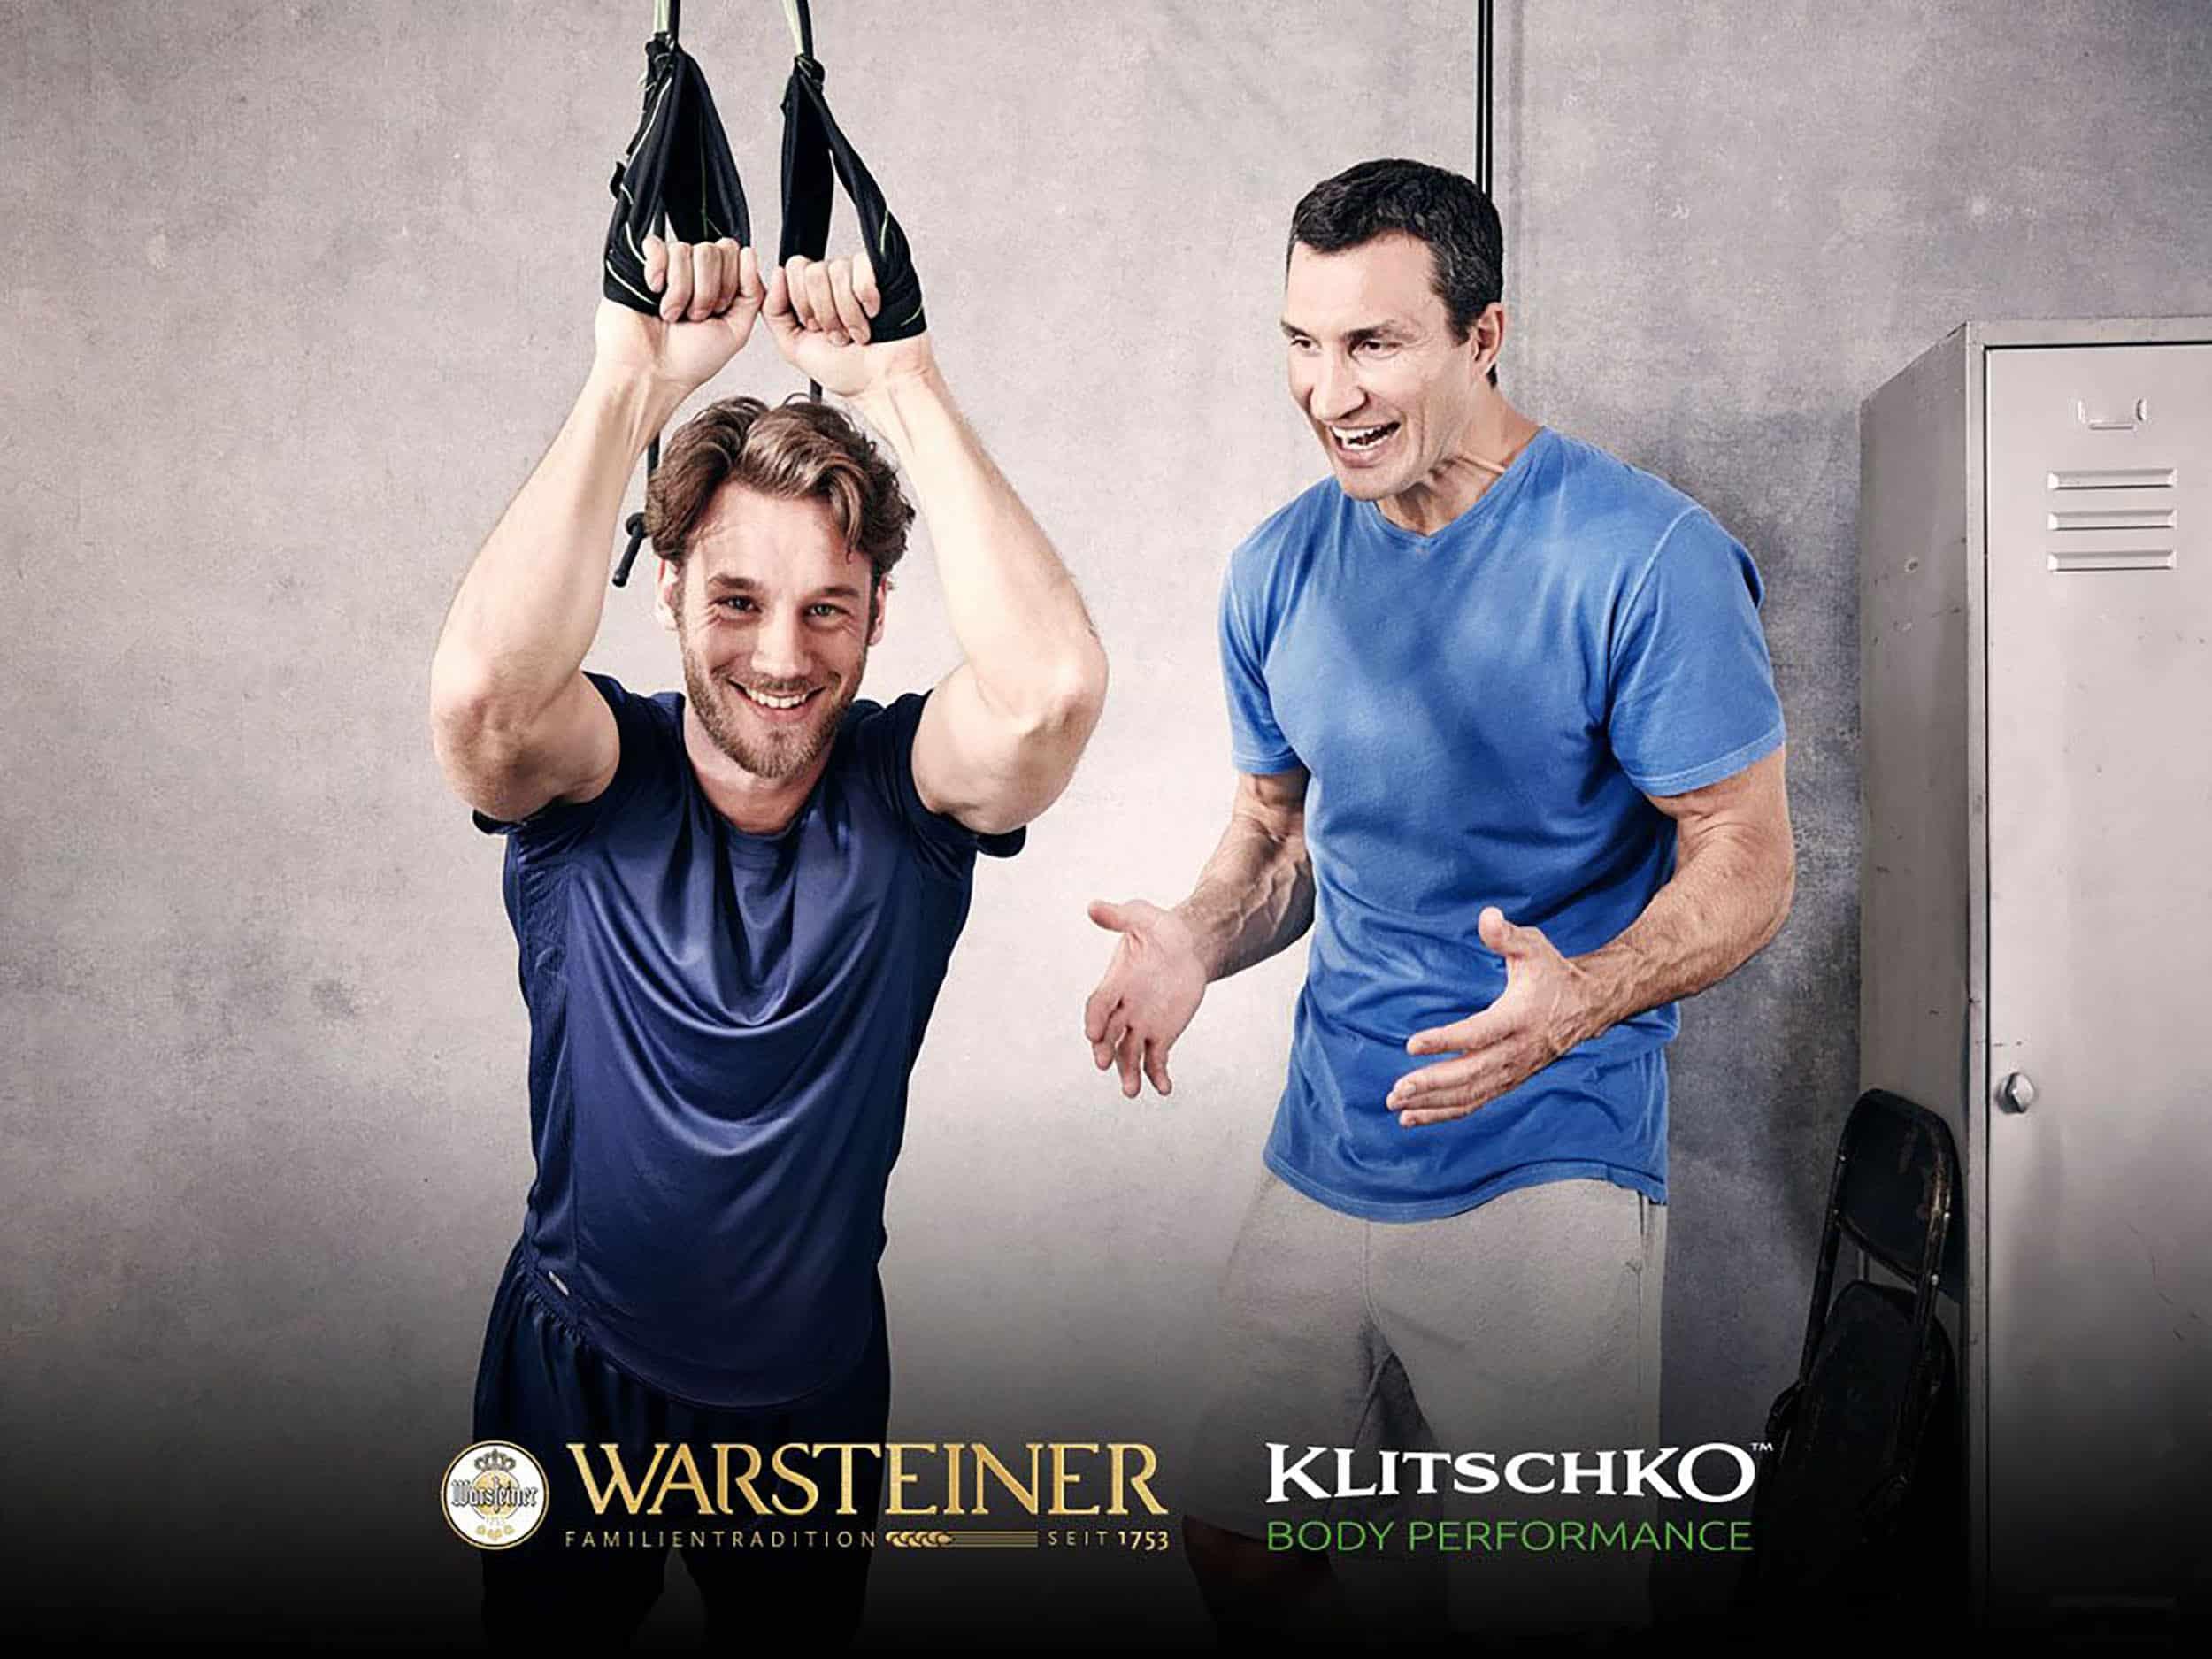 studio-ignatov-klitschko-warsteiner-imagekampagne-branding-02